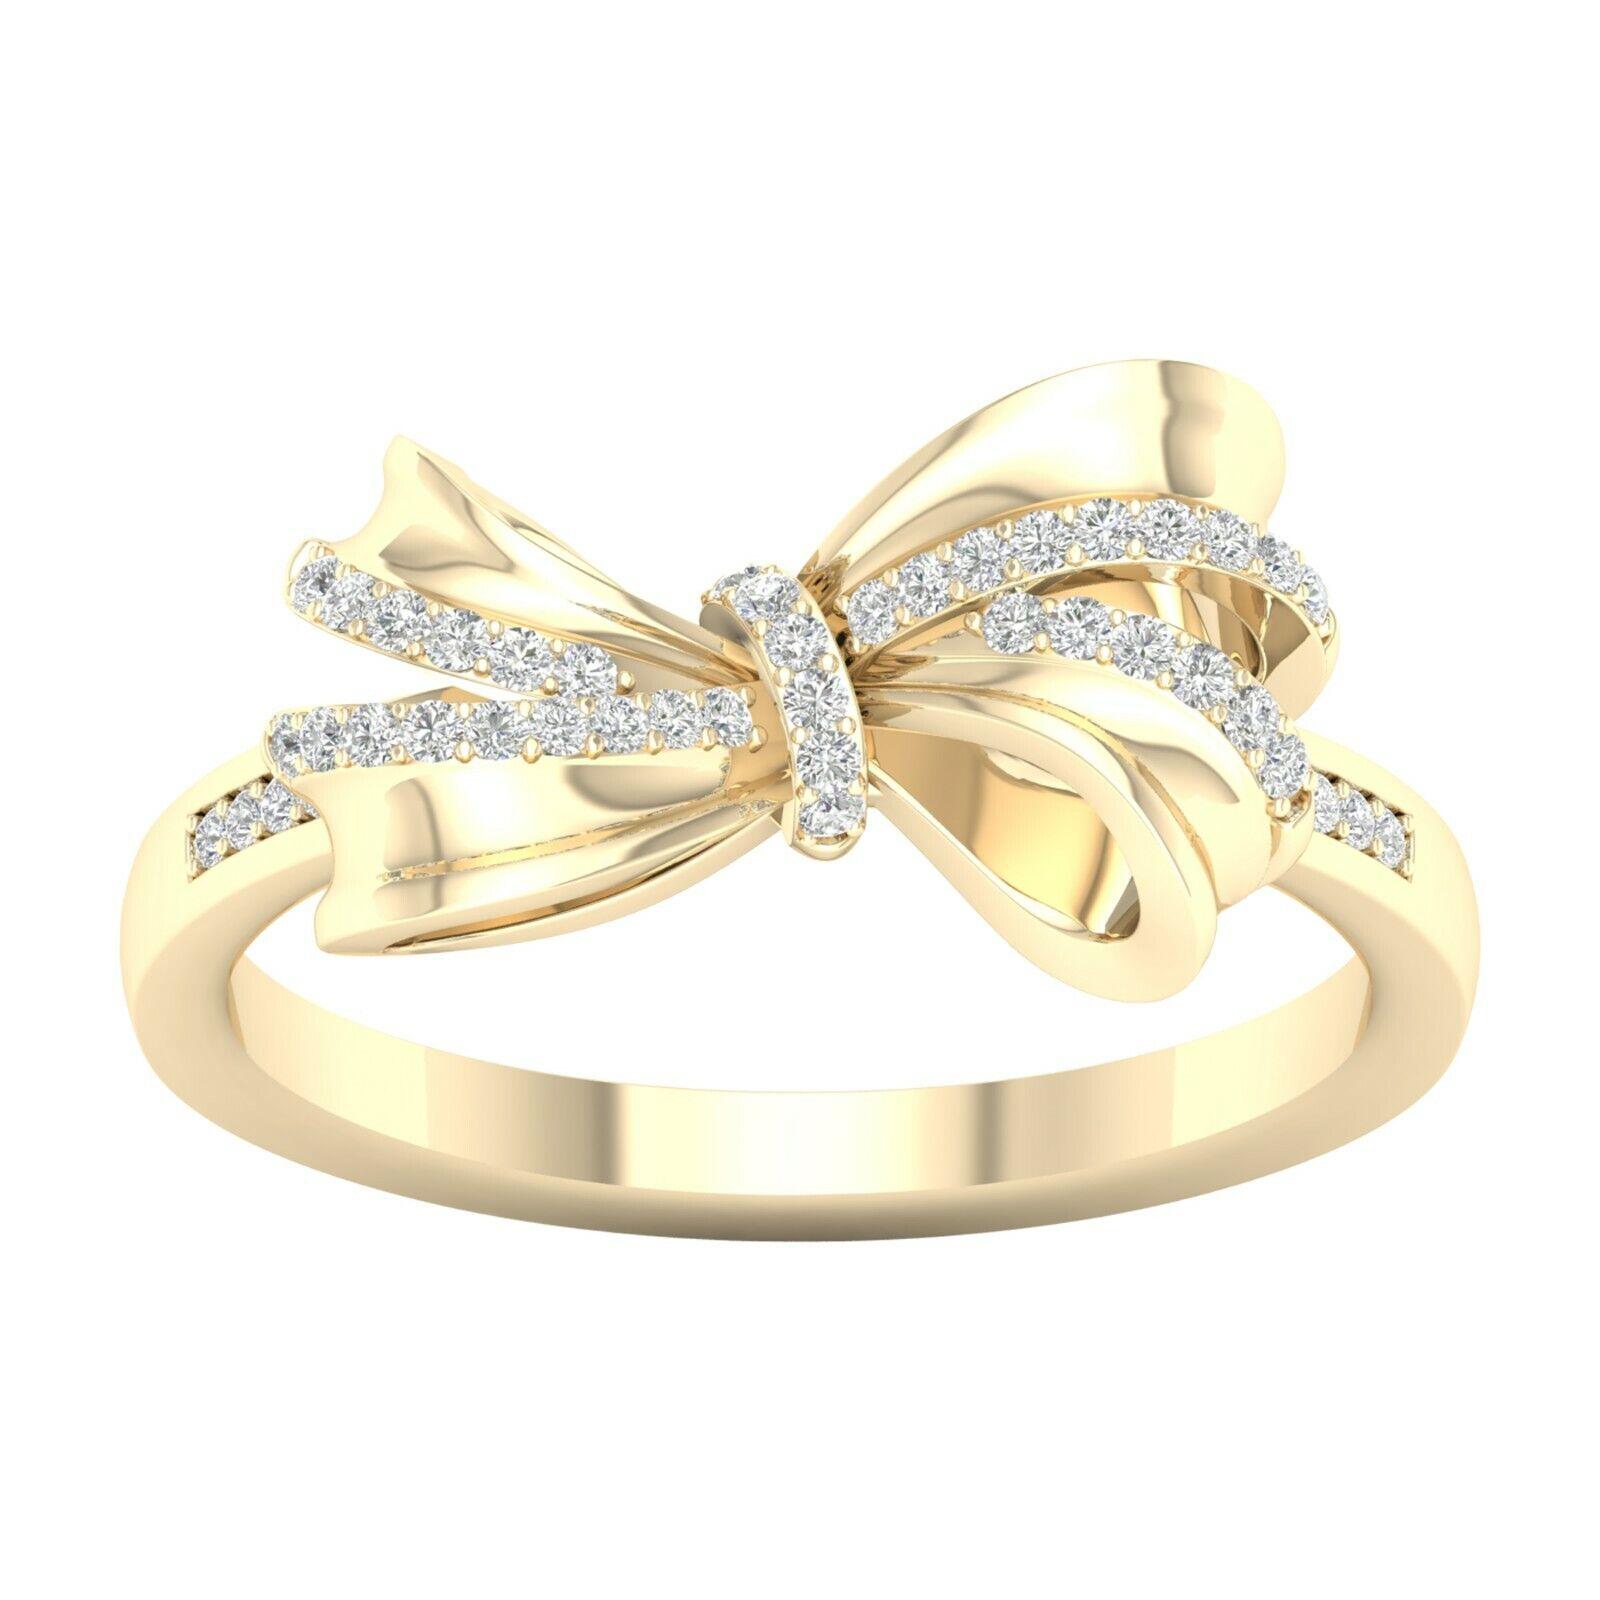 10k Yellow gold 0.12Ct TDW Diamond Knot Ribbon Ring